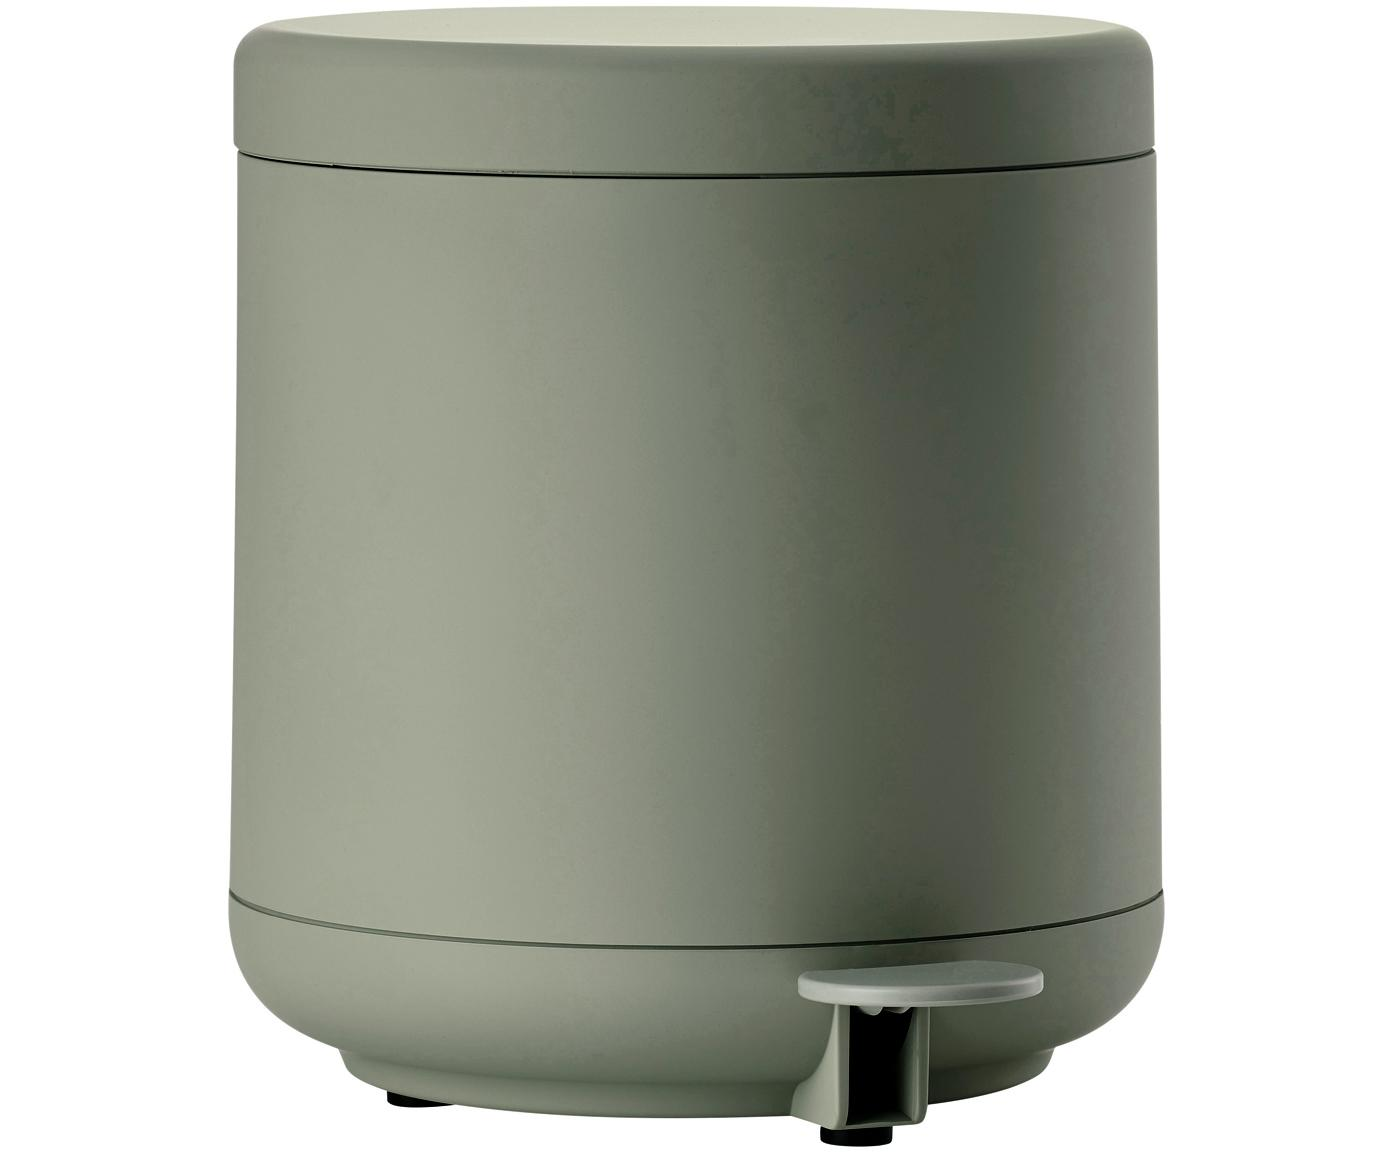 Abfalleimer Ume mit Pedal-Funktion, Kunststoff (ABS), Eukalyptusgrün, Ø 20 x H 22 cm